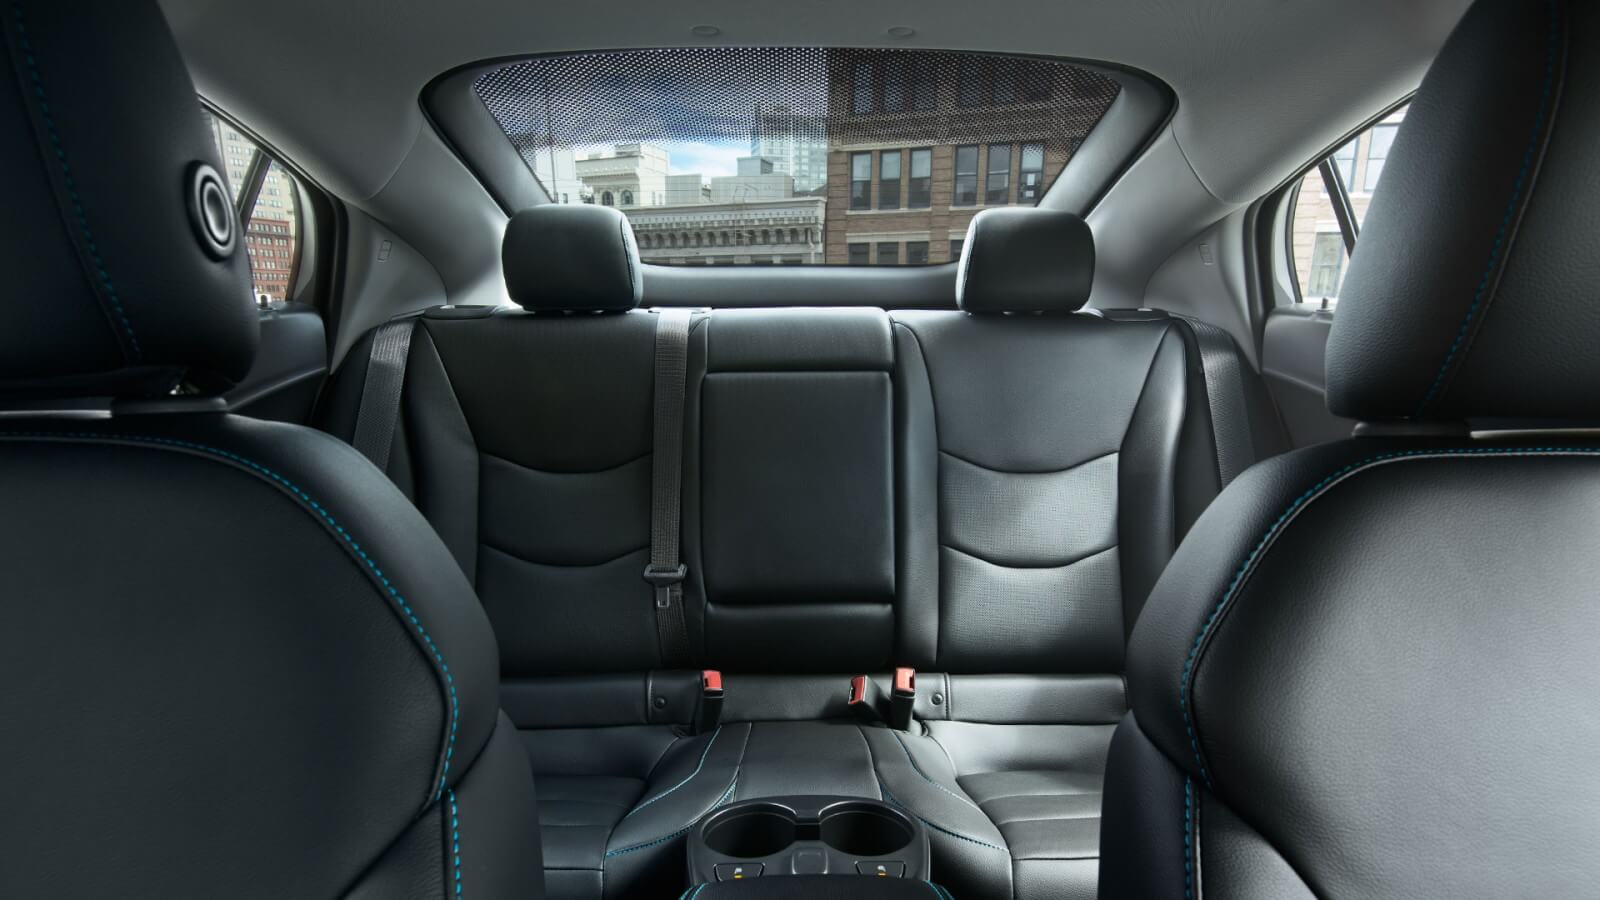 2016 Chevrolet Volt interior seating